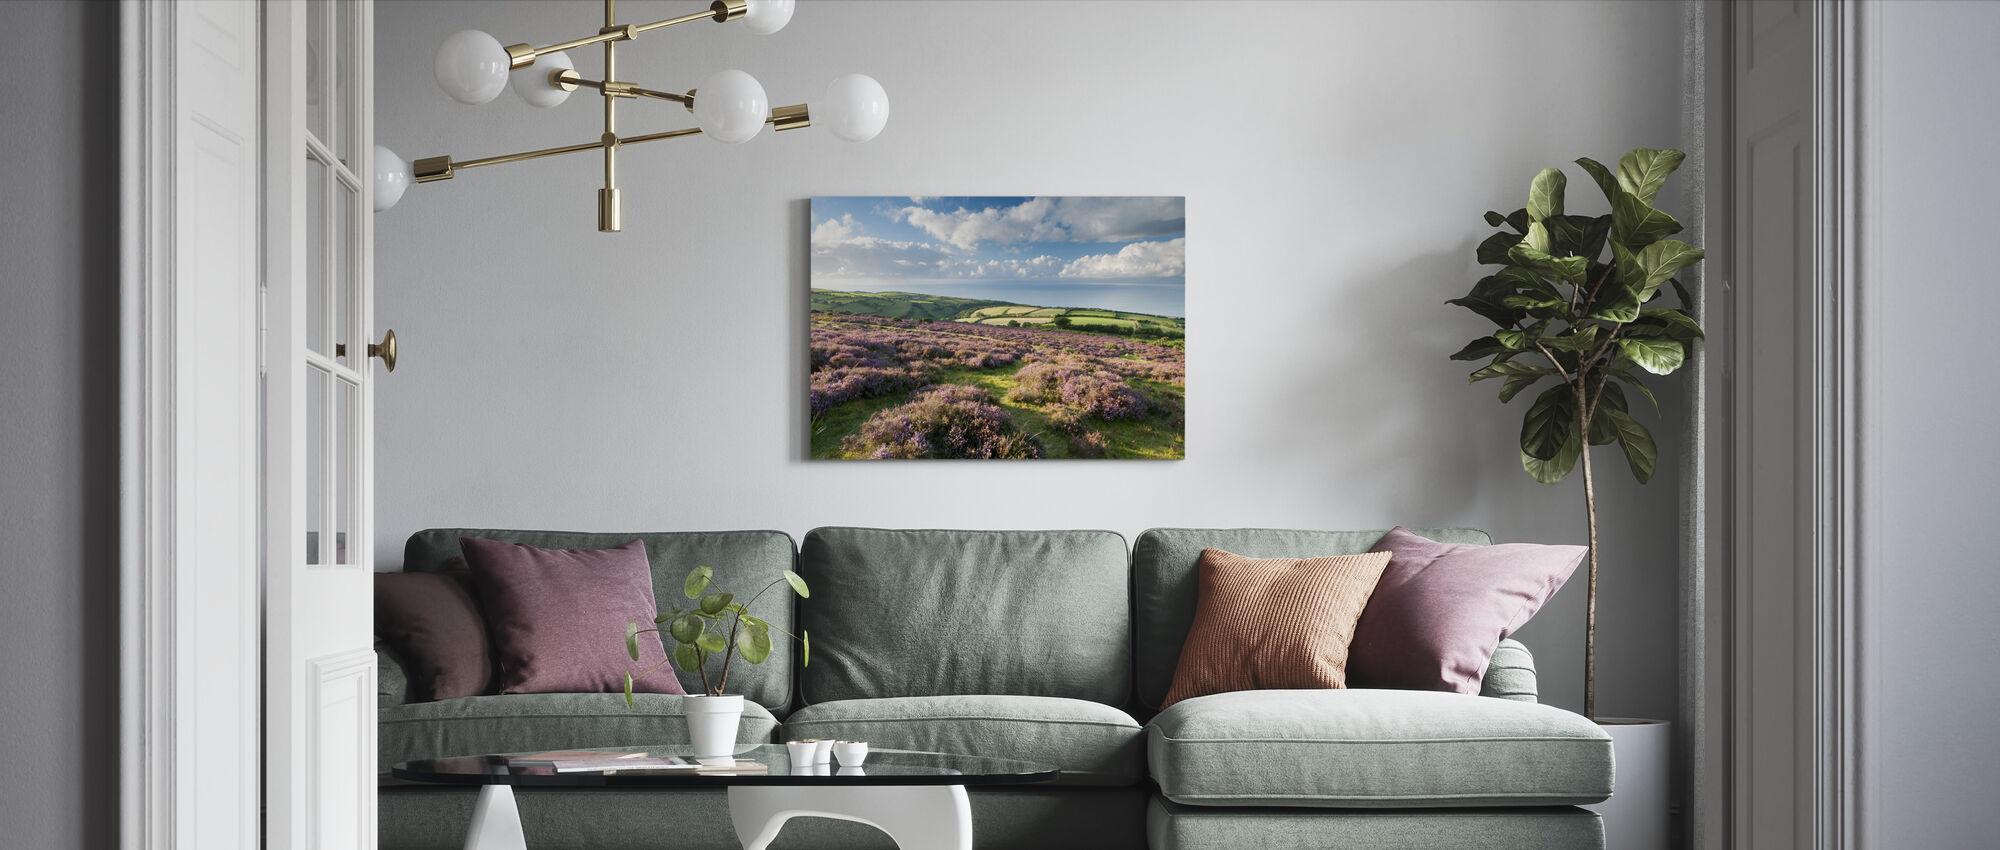 Flowering Heather - Canvas print - Living Room